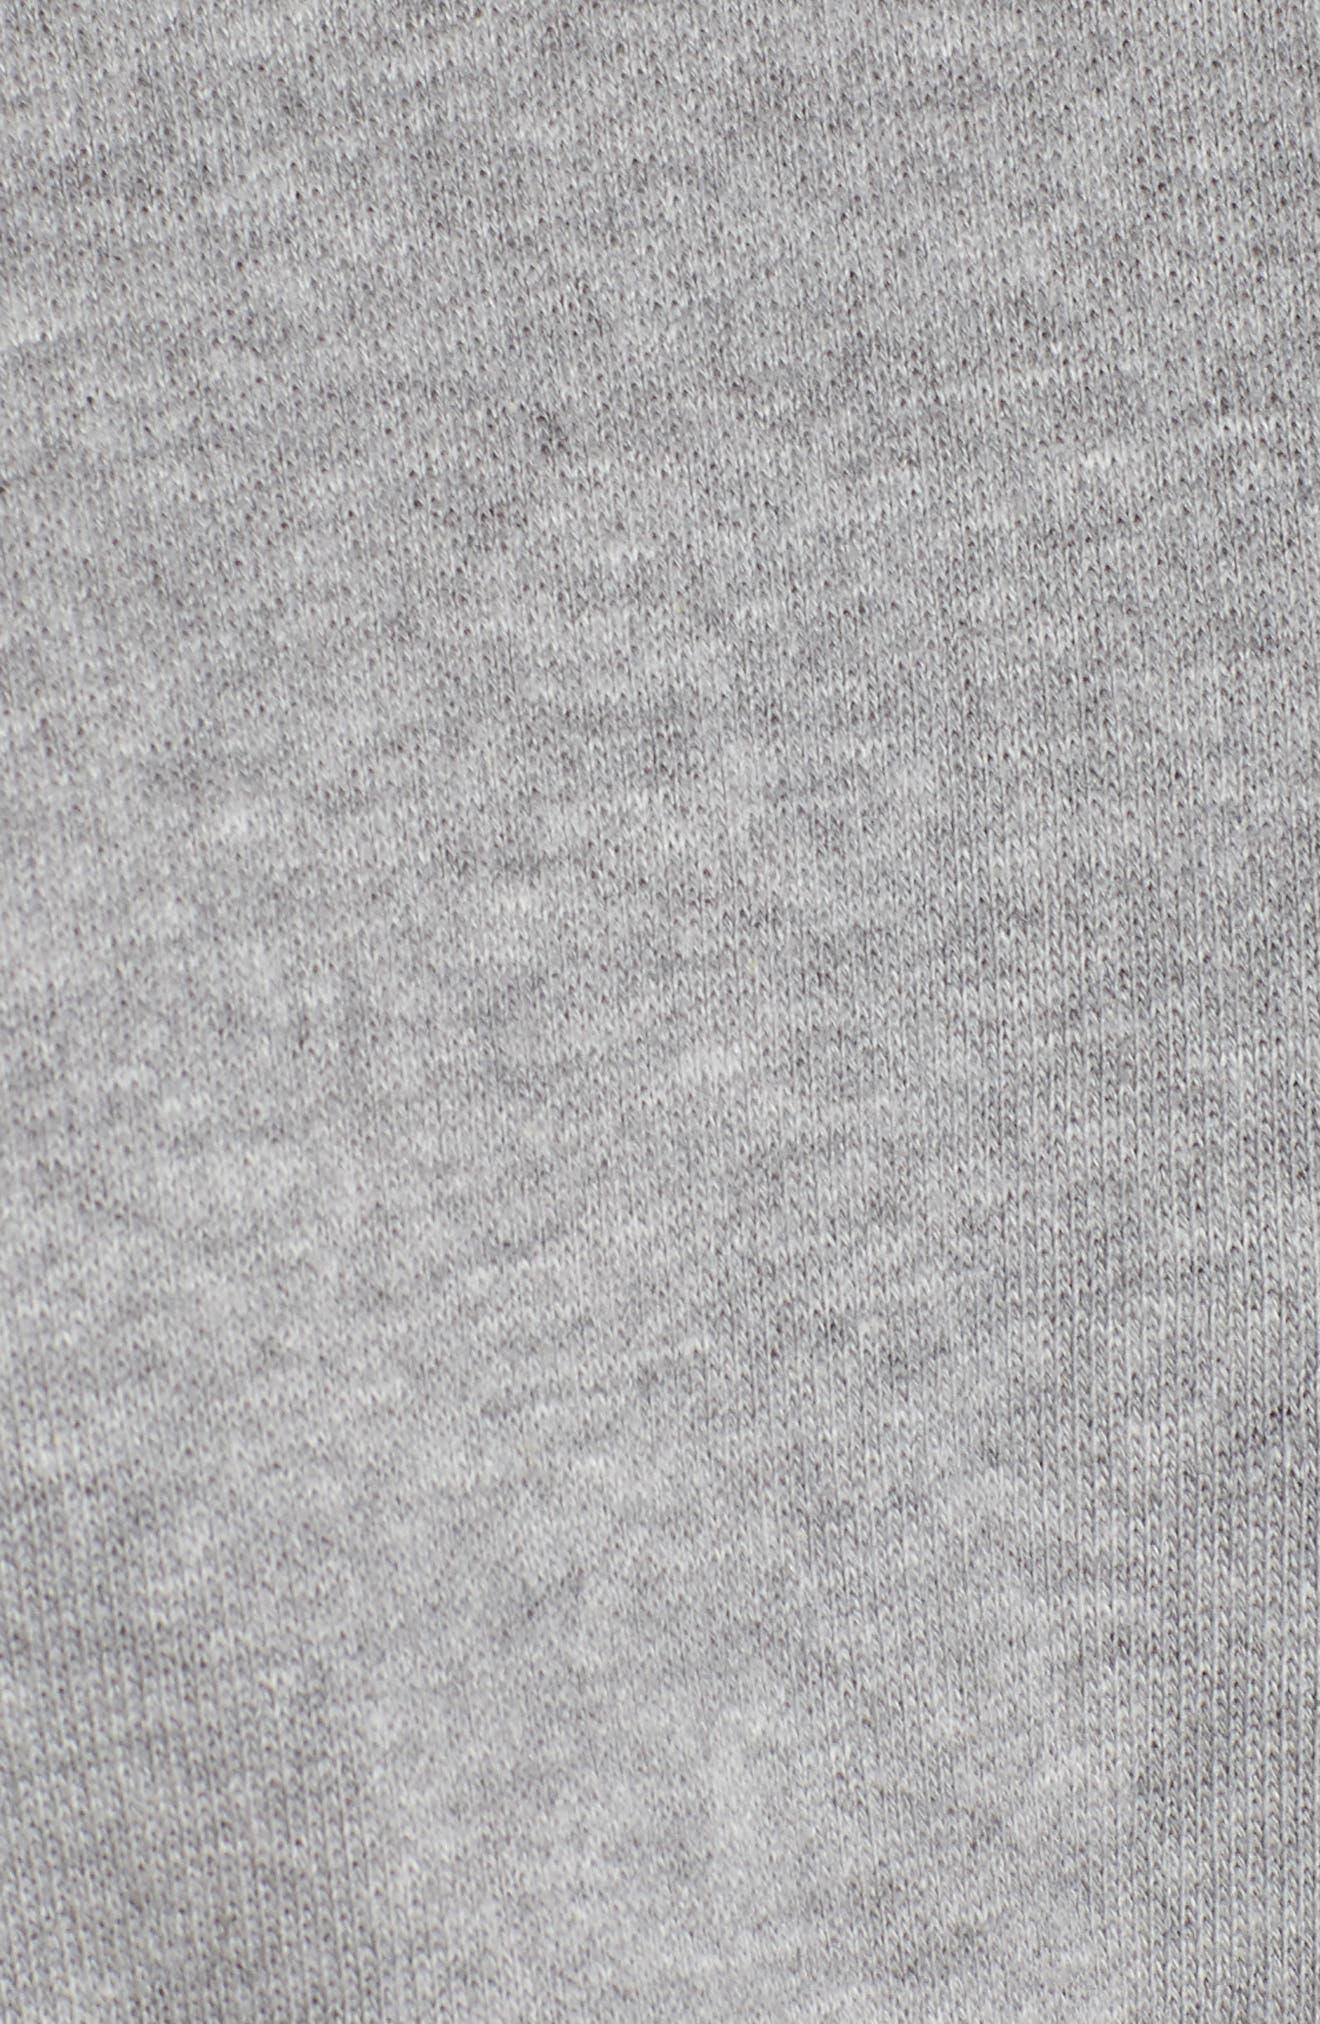 Crop Sweatshirt,                             Alternate thumbnail 5, color,                             020